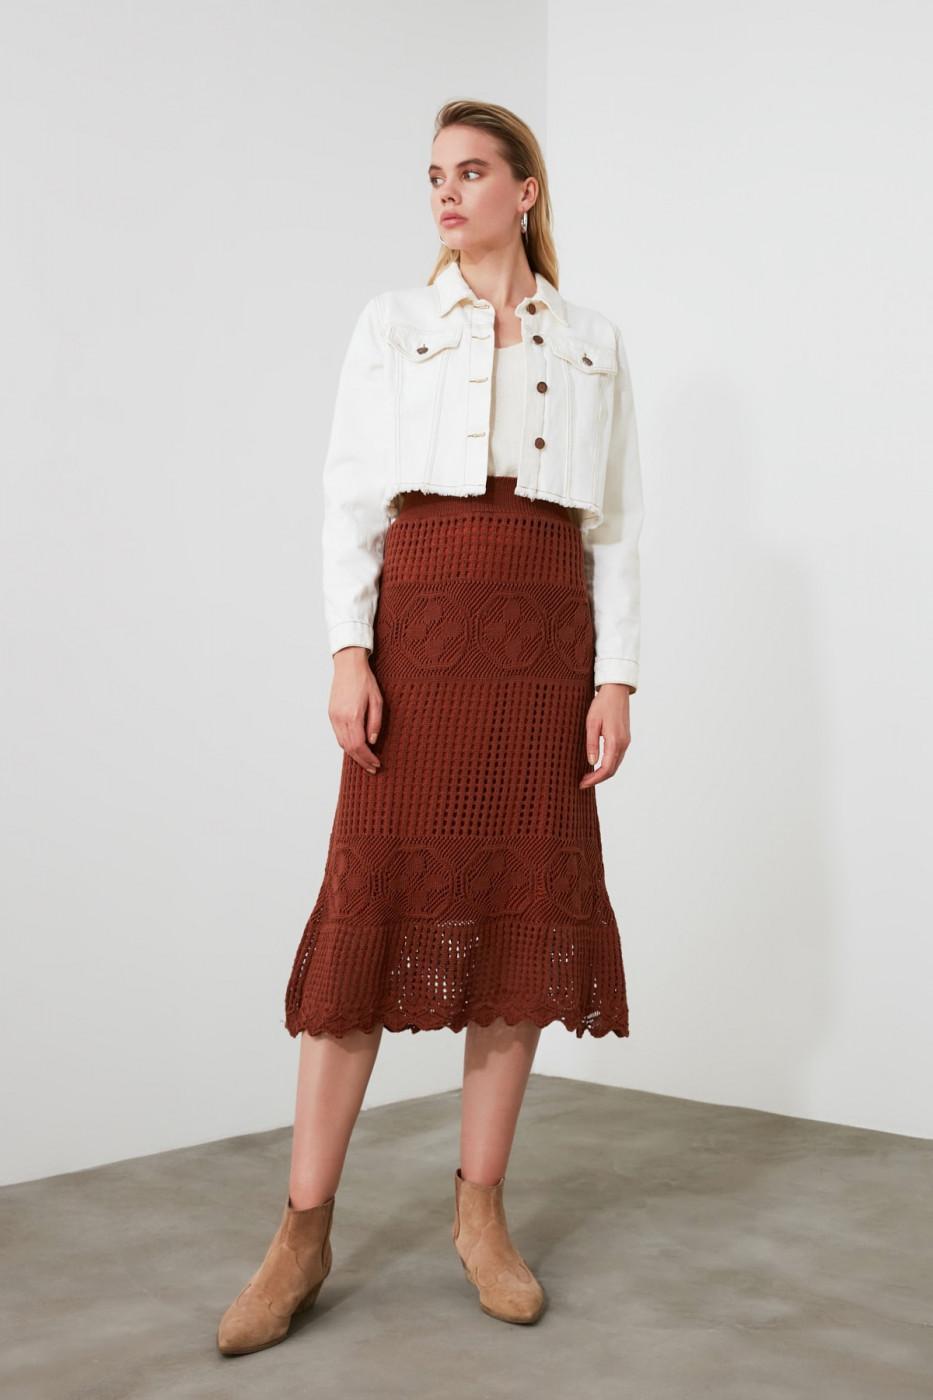 Trendyol Brown Mesh Detailed Knitwear Skirt